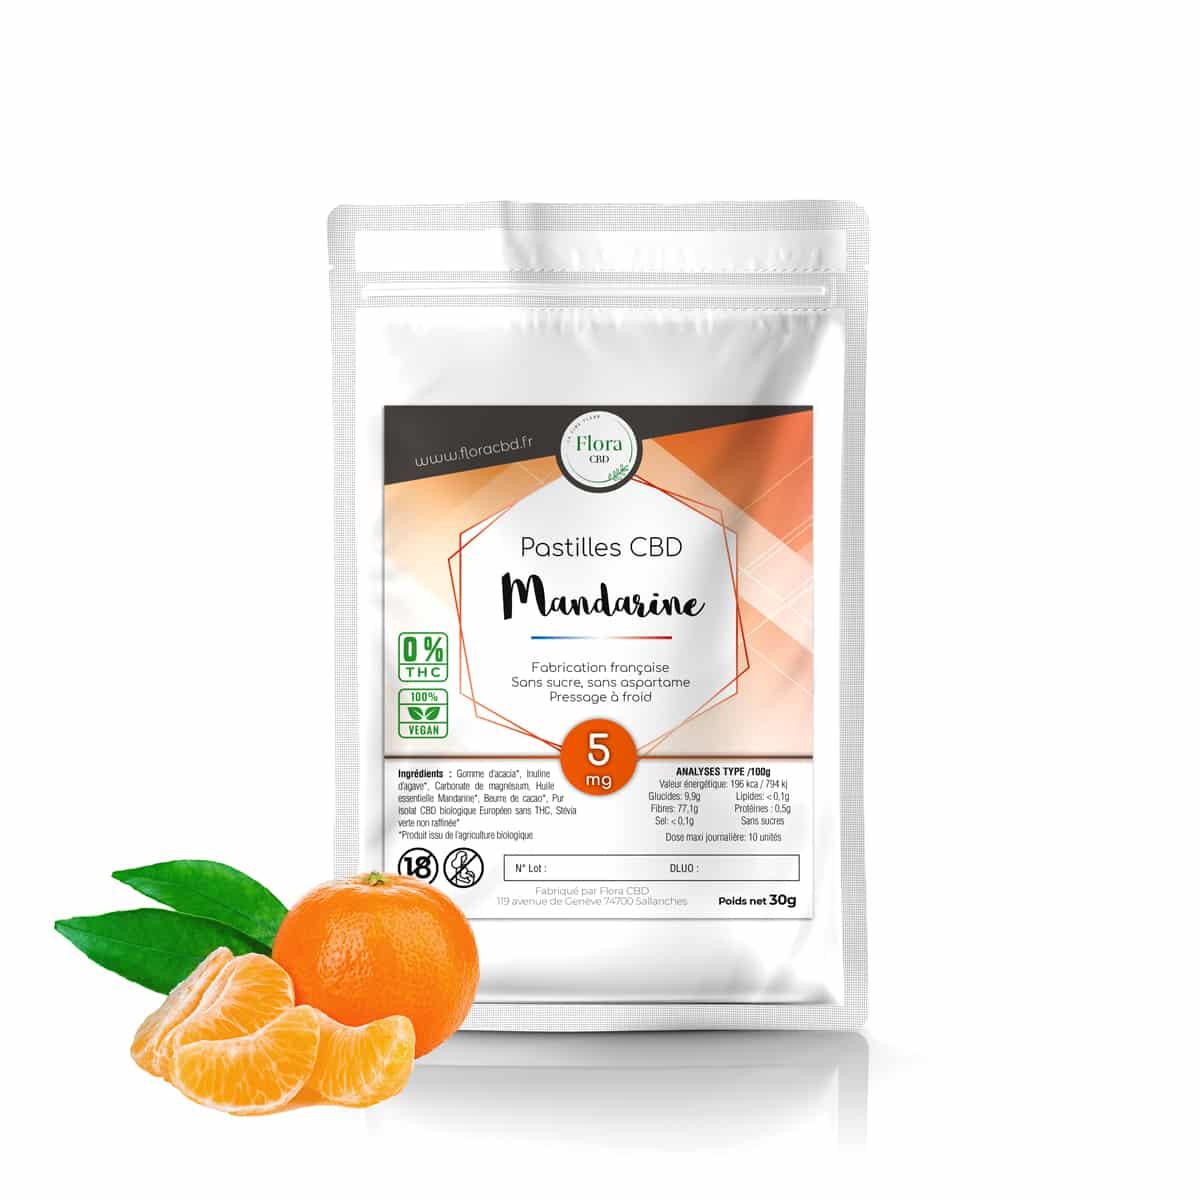 Pastilles CBD 5mg Mandarine - Flora CBD